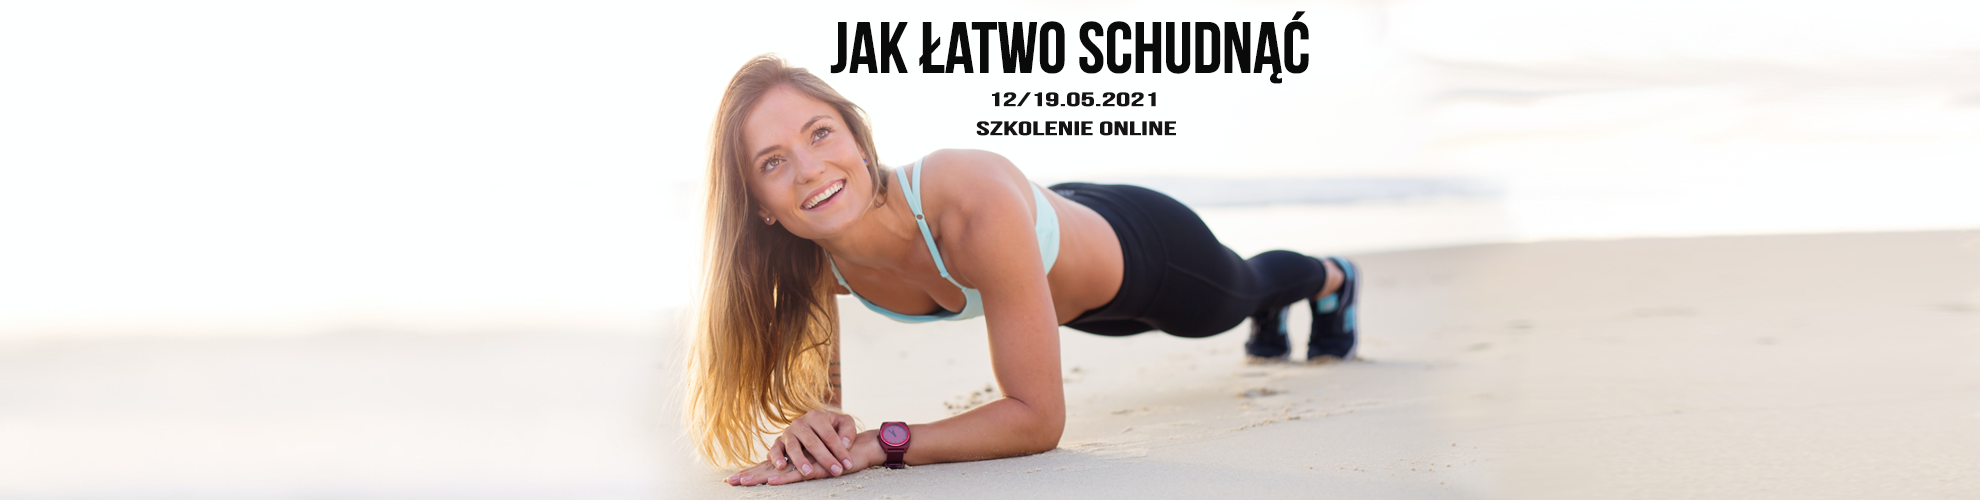 JAK-LATWO-SCHUDNAC-3